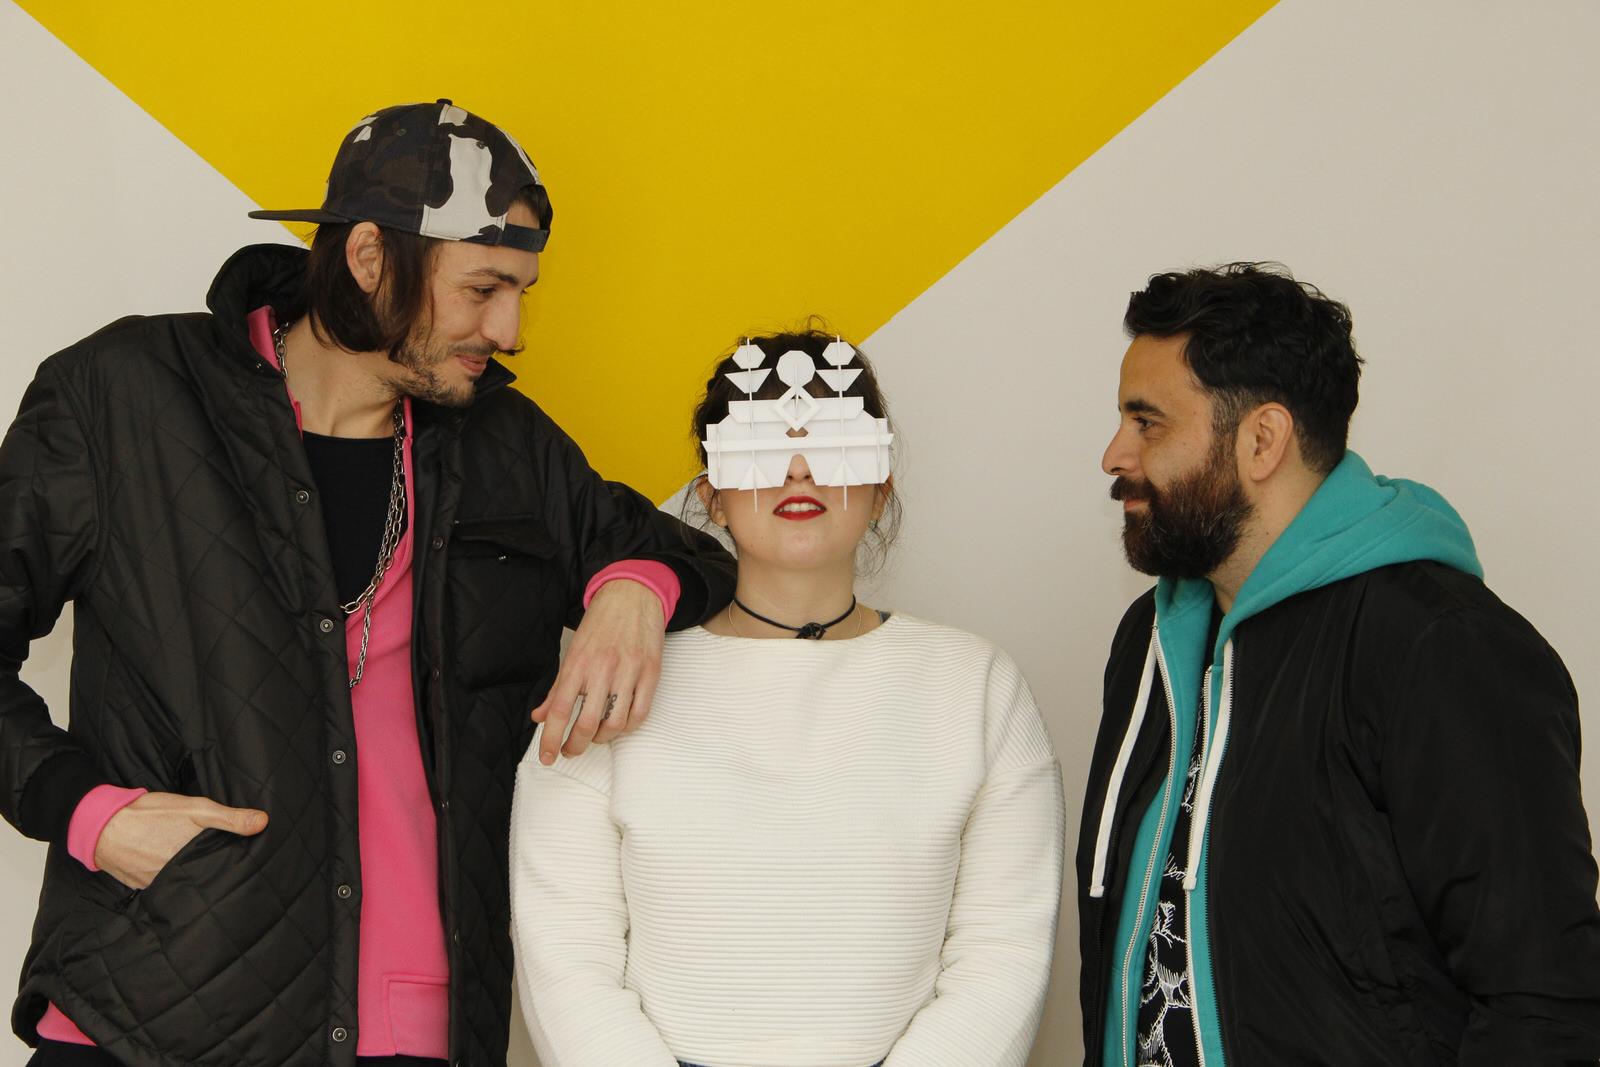 Paul Fava. Josefina Fogel Nuñez y Sael. Foto: Adri Godis